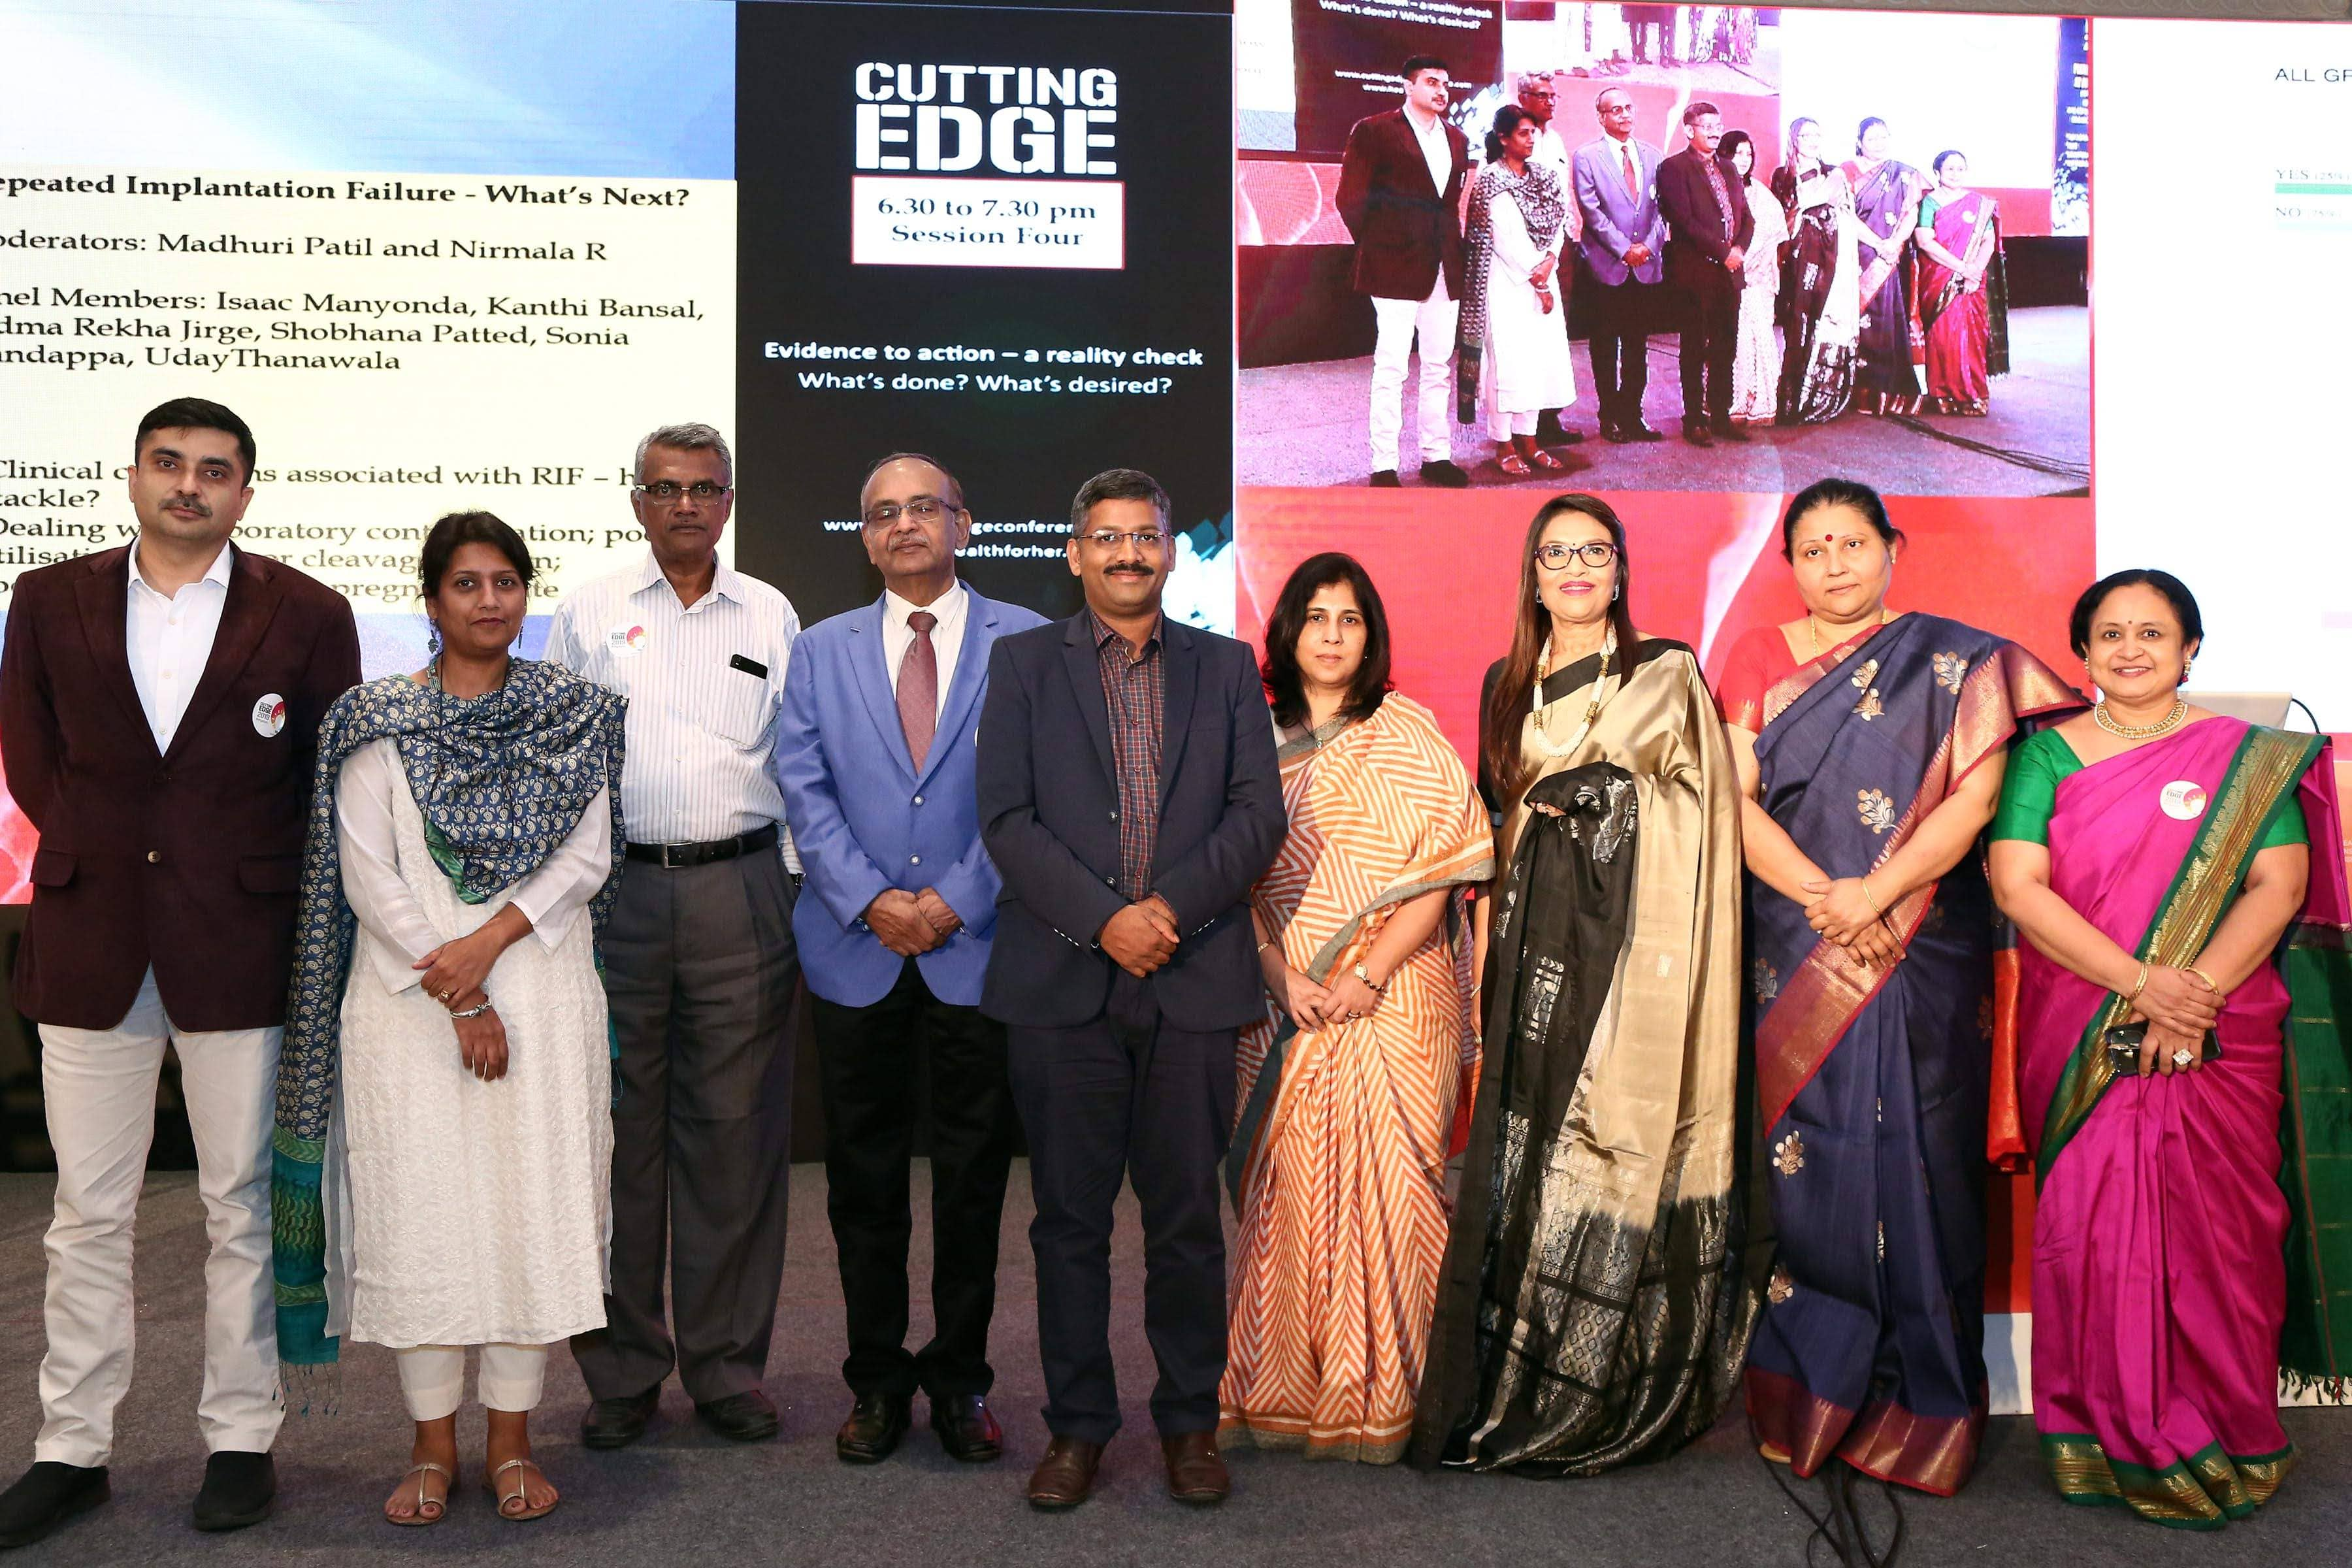 Cutting Edge 2019 Bengaluru - Day 1 11.05.19 @ ITC Gardenia